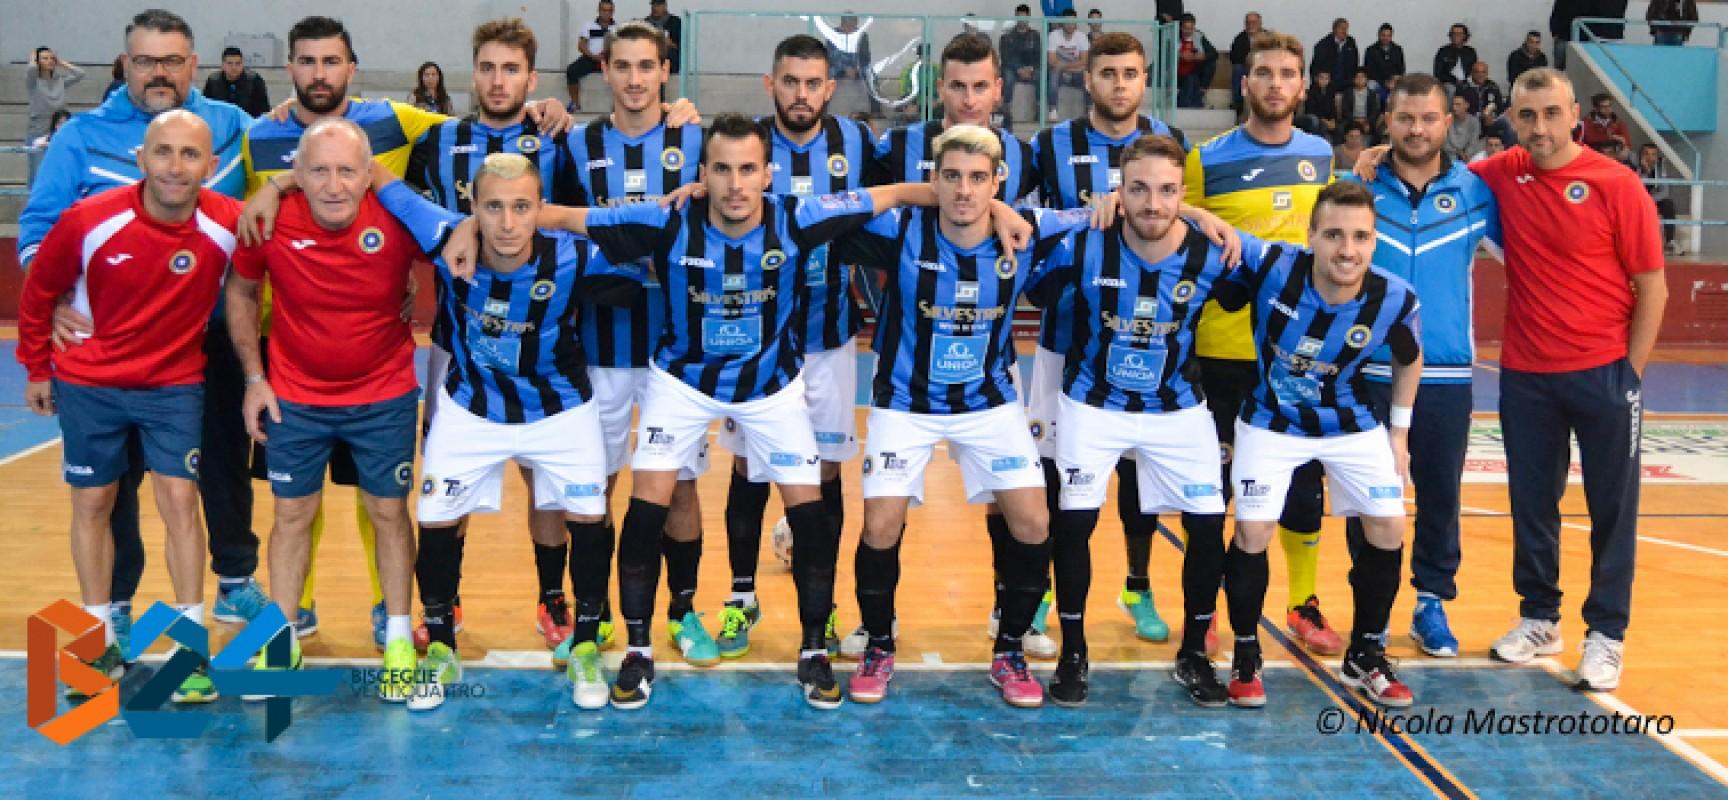 Catania corsaro al PalaDolmen, Futsal Bisceglie ko